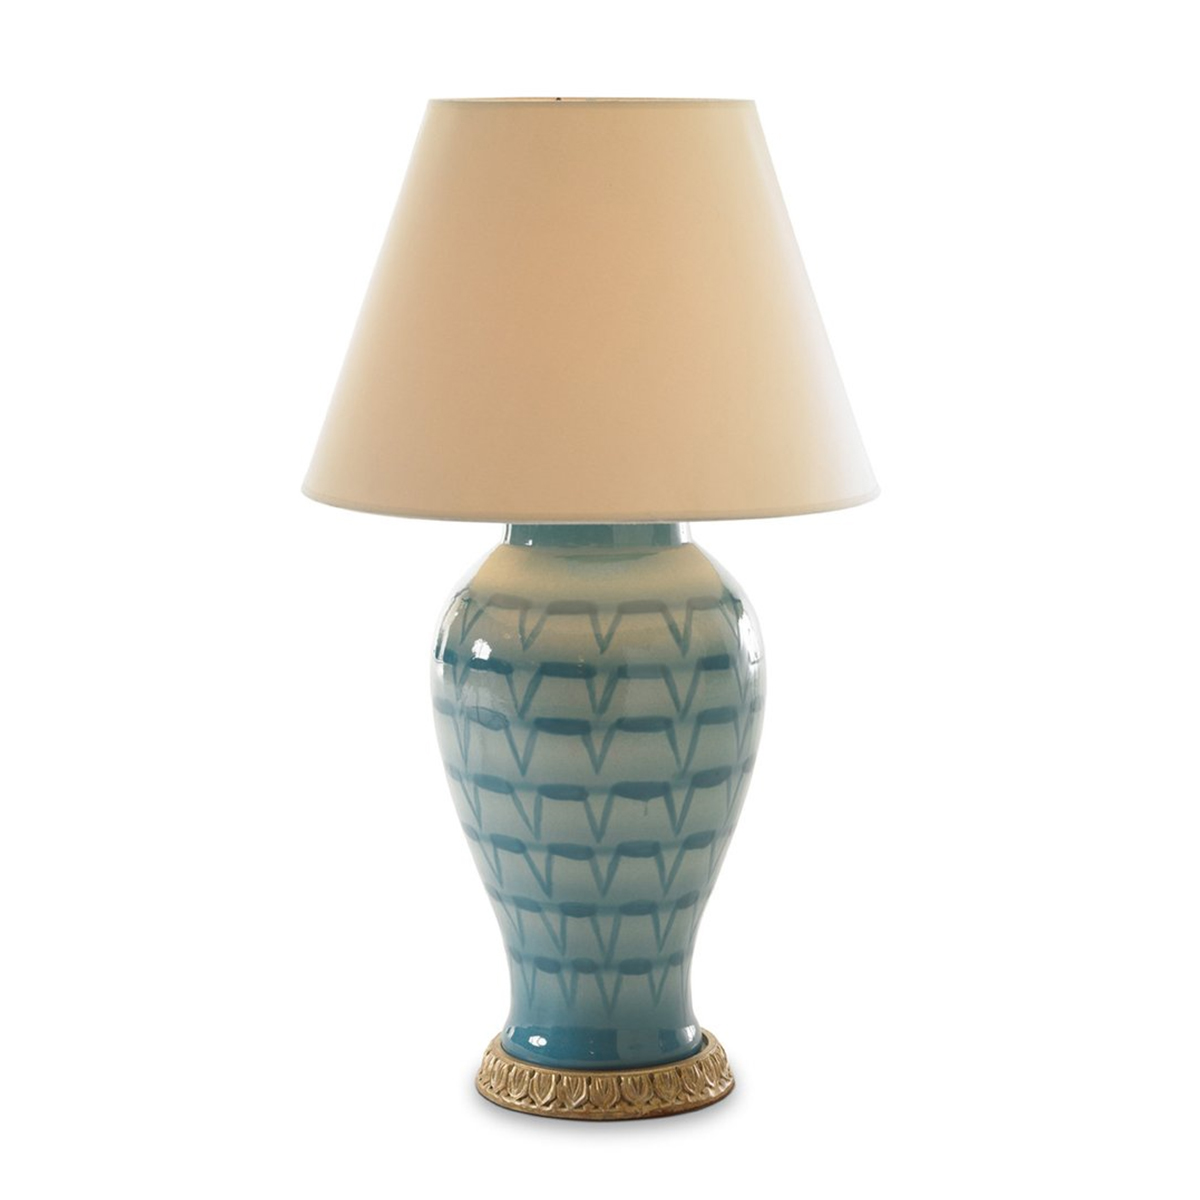 bunny williams turquoise feather lamp okl.jpg